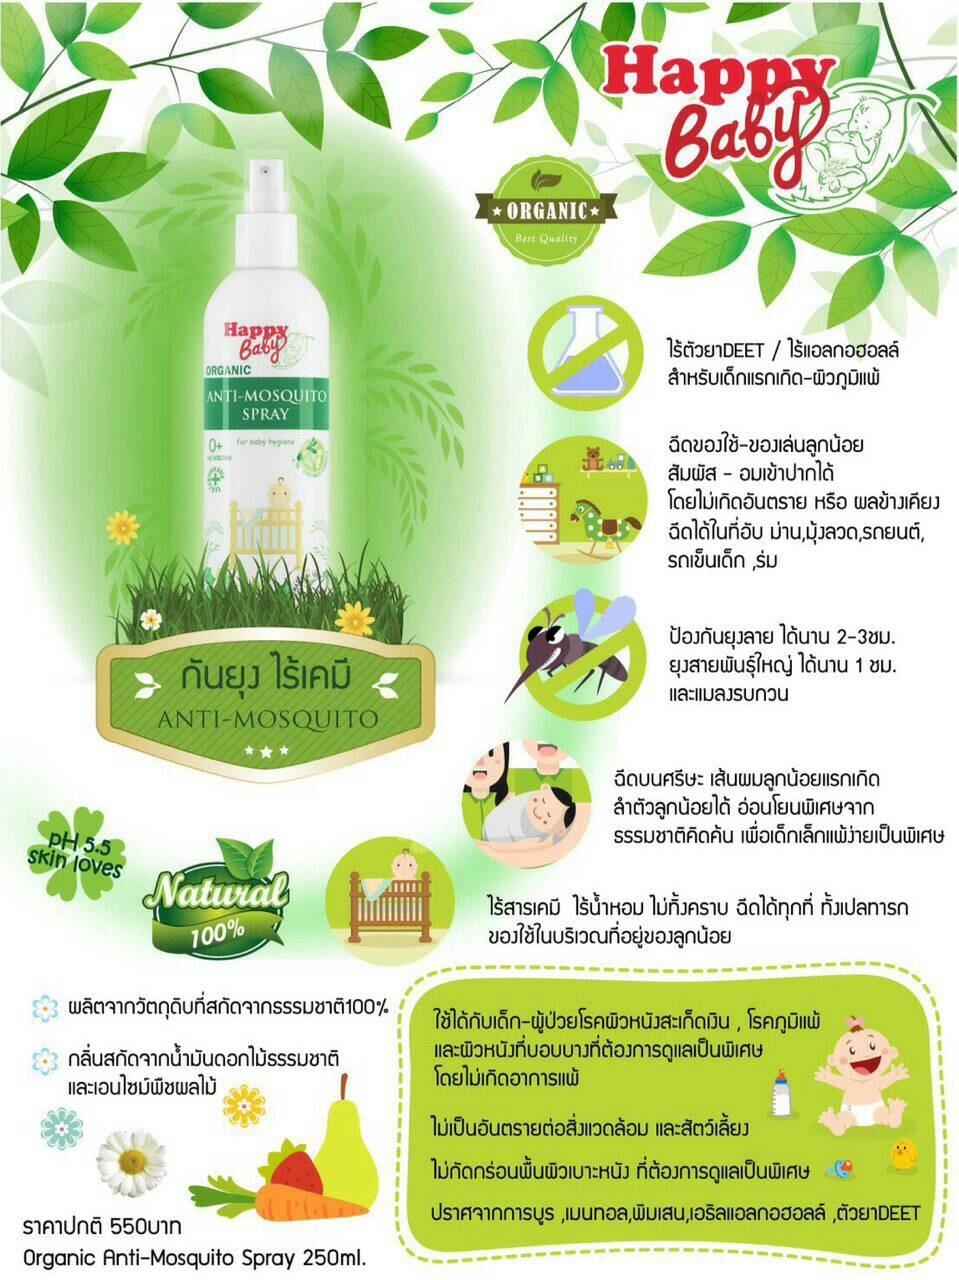 Organic Anti-Mosquito Spray สเปรย์กันยุงออร์แกนิค 250ml